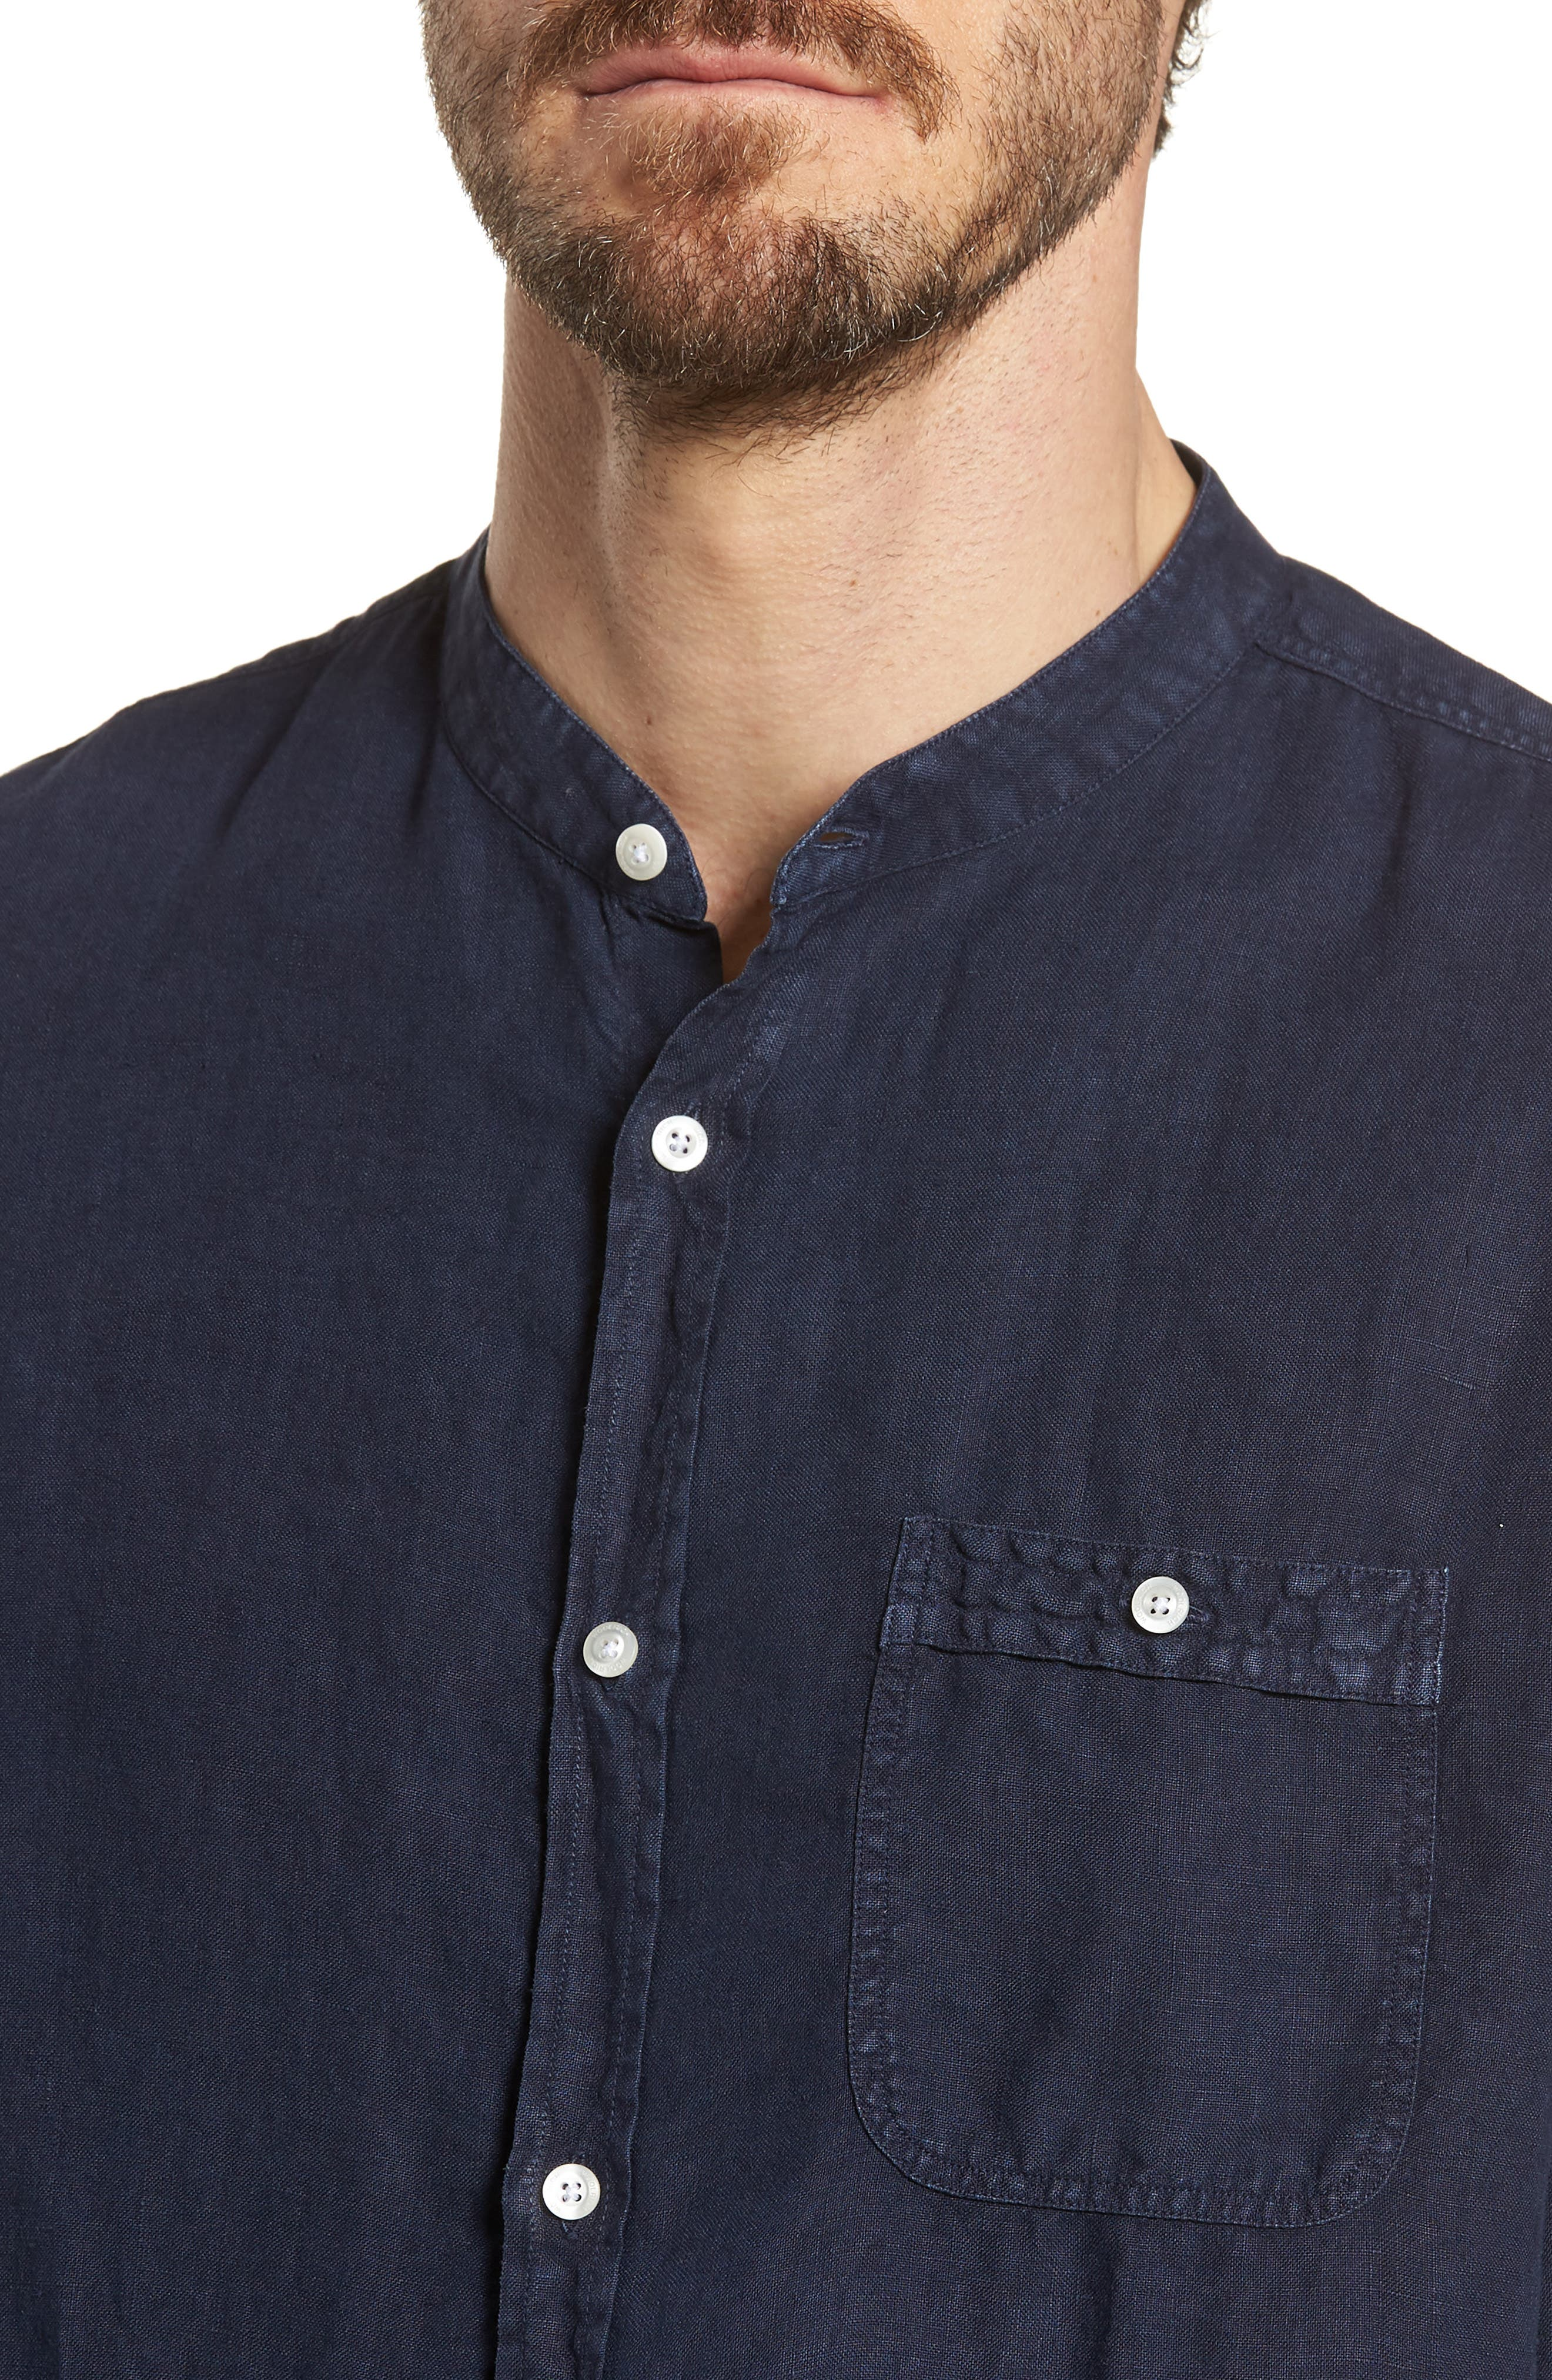 & Bros. Regular Fit Band Collar Linen Shirt,                             Alternate thumbnail 4, color,                             477